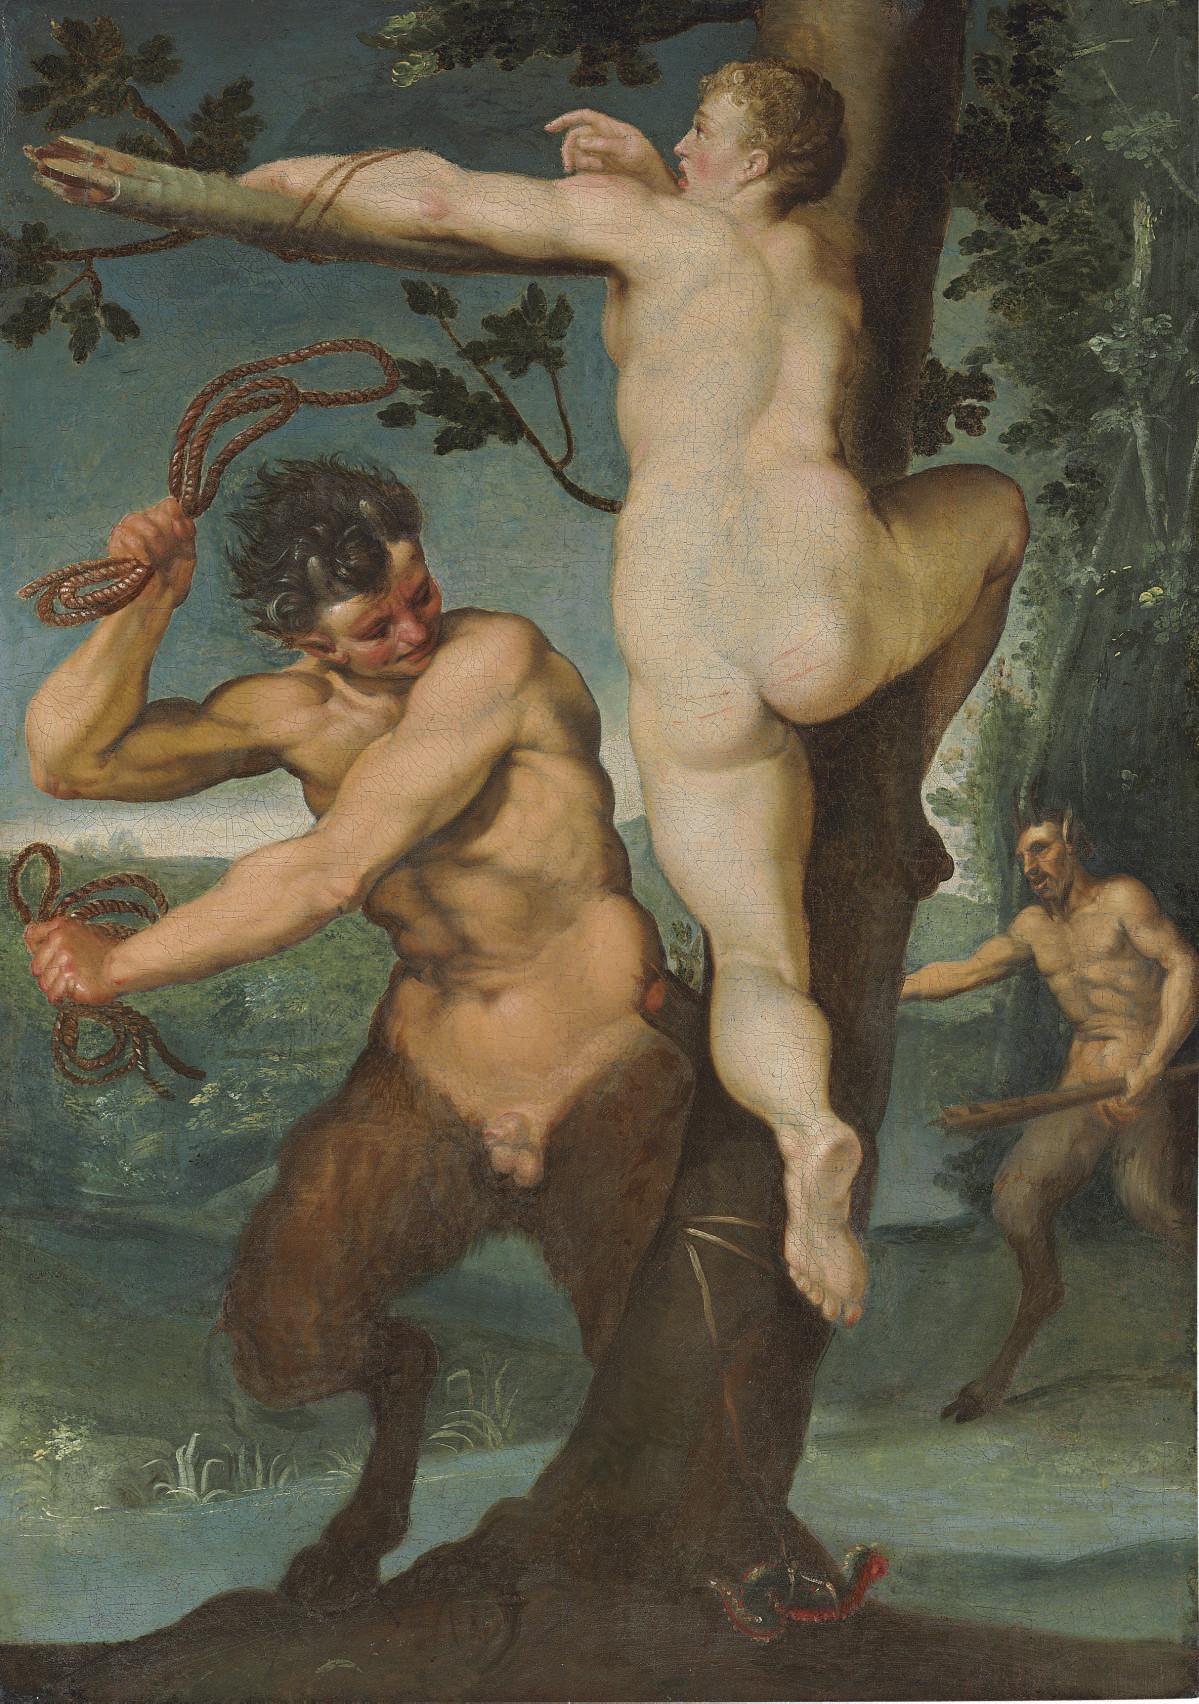 A Franco-Flemish Artist after Agostino Carracci, c. 1590